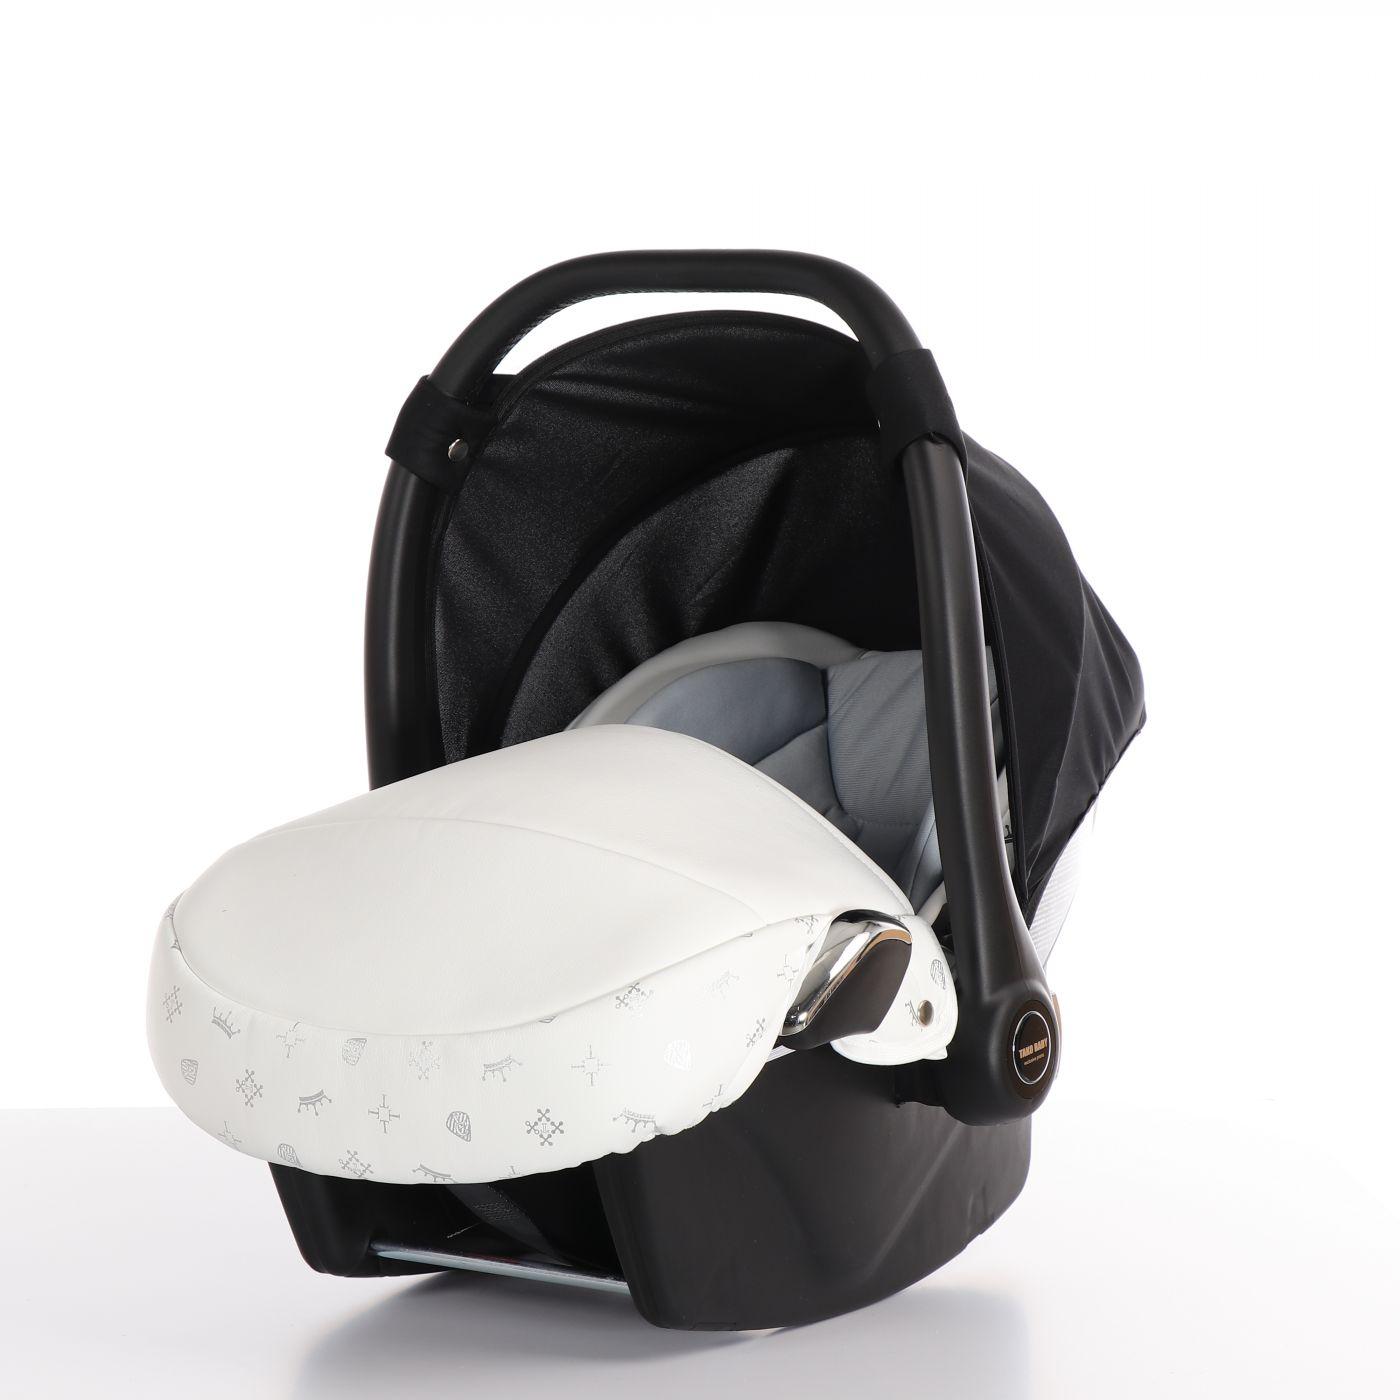 Автокресло TAKO LARET IMPERIAL (Ткань/кожа) белый (ATLI-01)